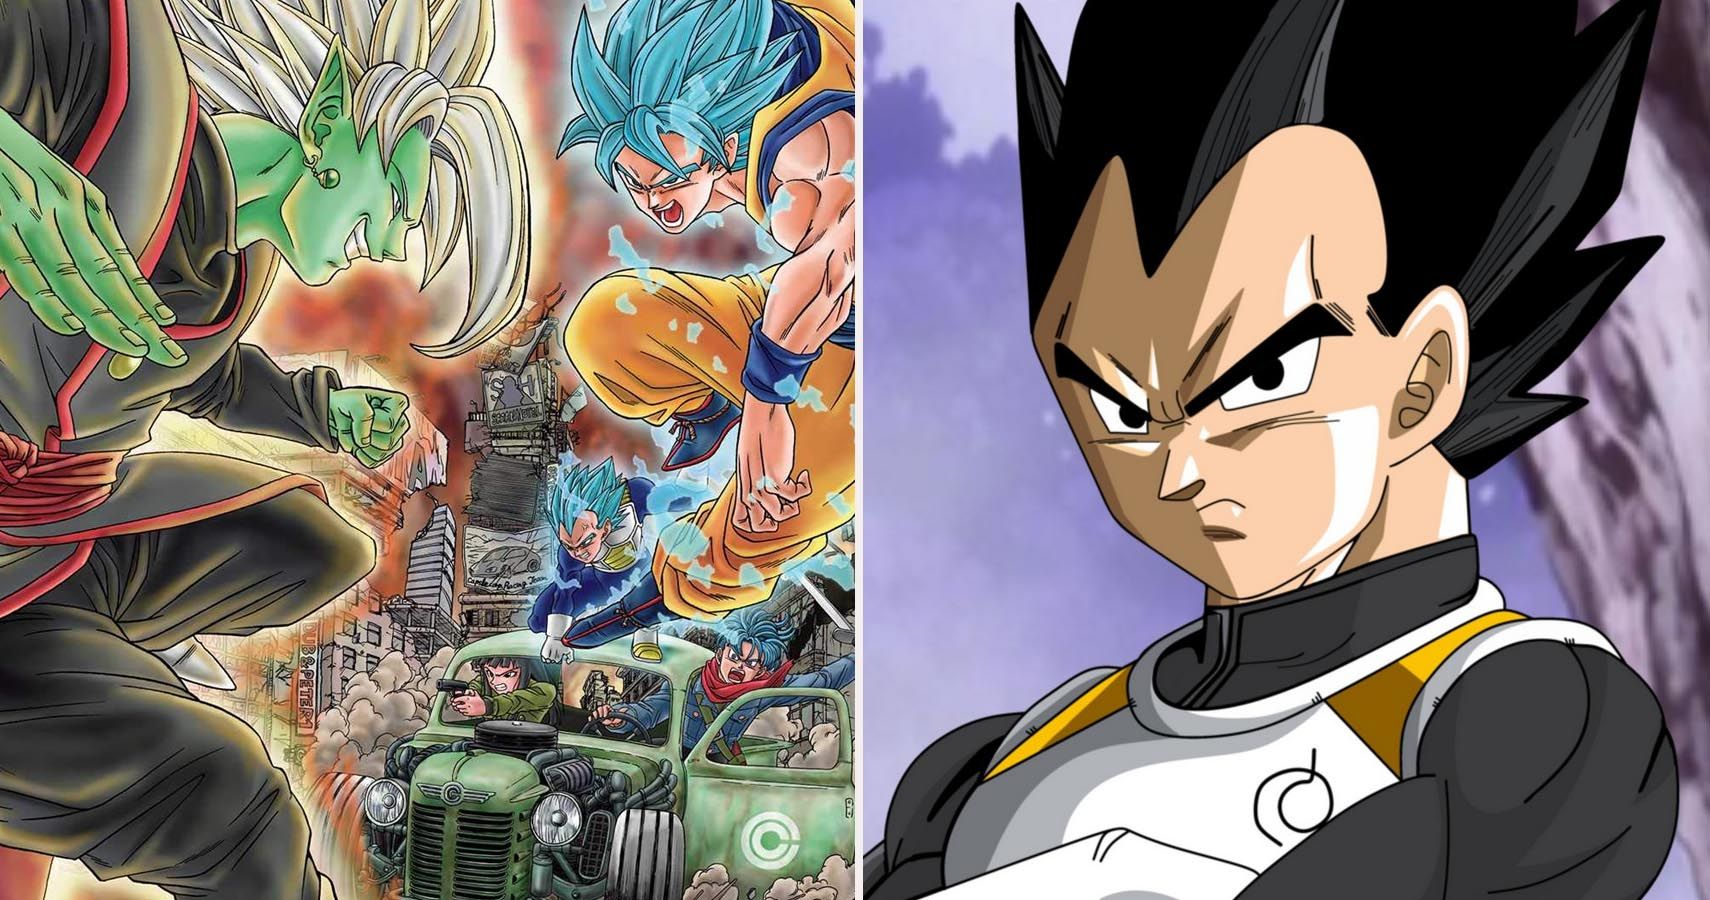 Dragon Ball Super: 5 Ways The Manga Is Better Than The Anime (& 5 Ways The Anime Is Better)